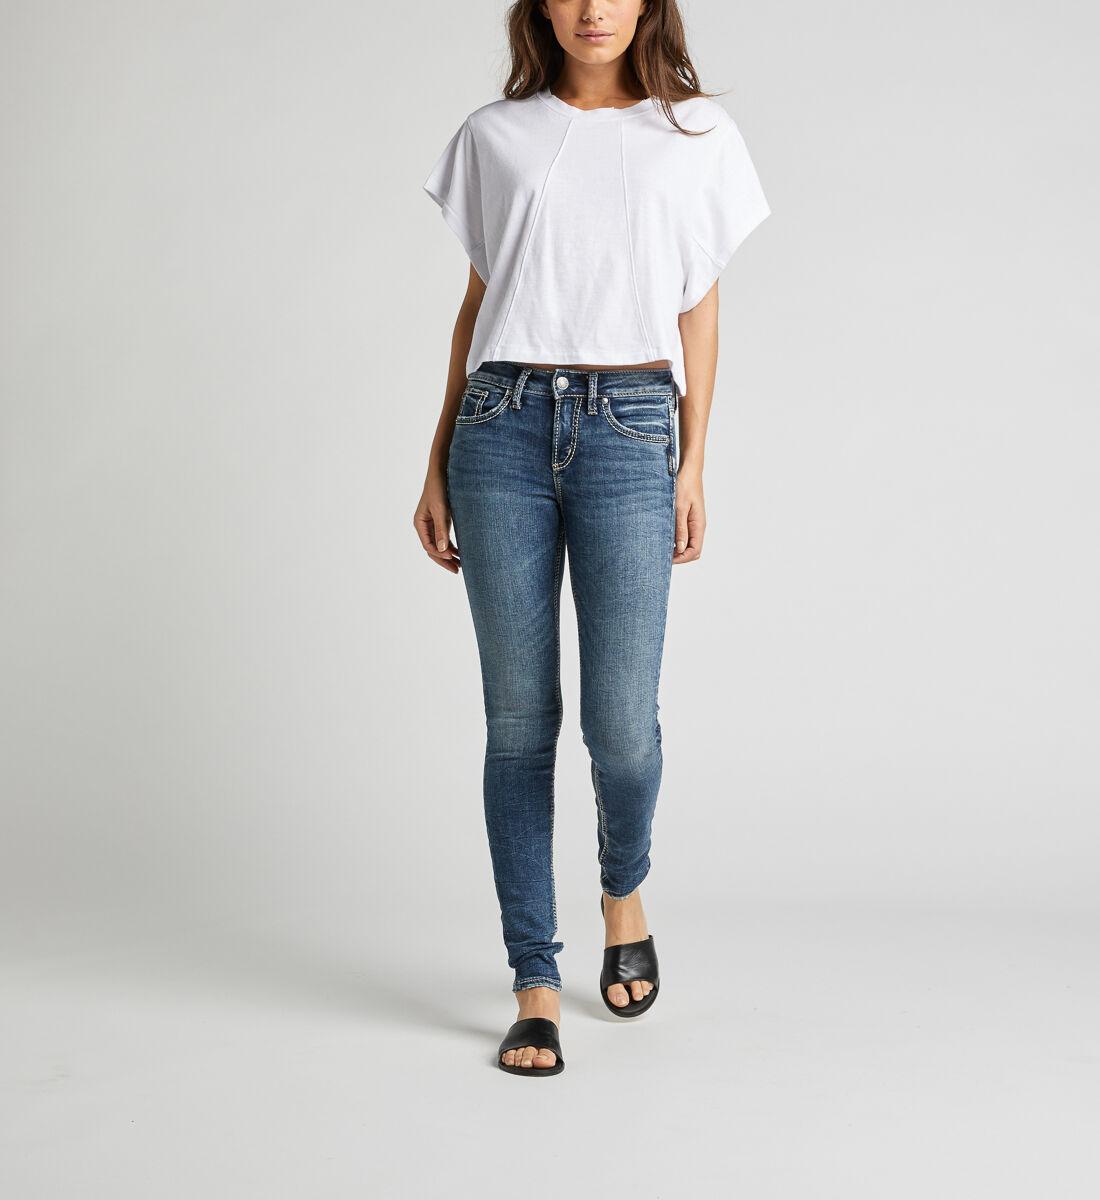 Avery High Rise Skinny Leg Jeans Alt Image 1